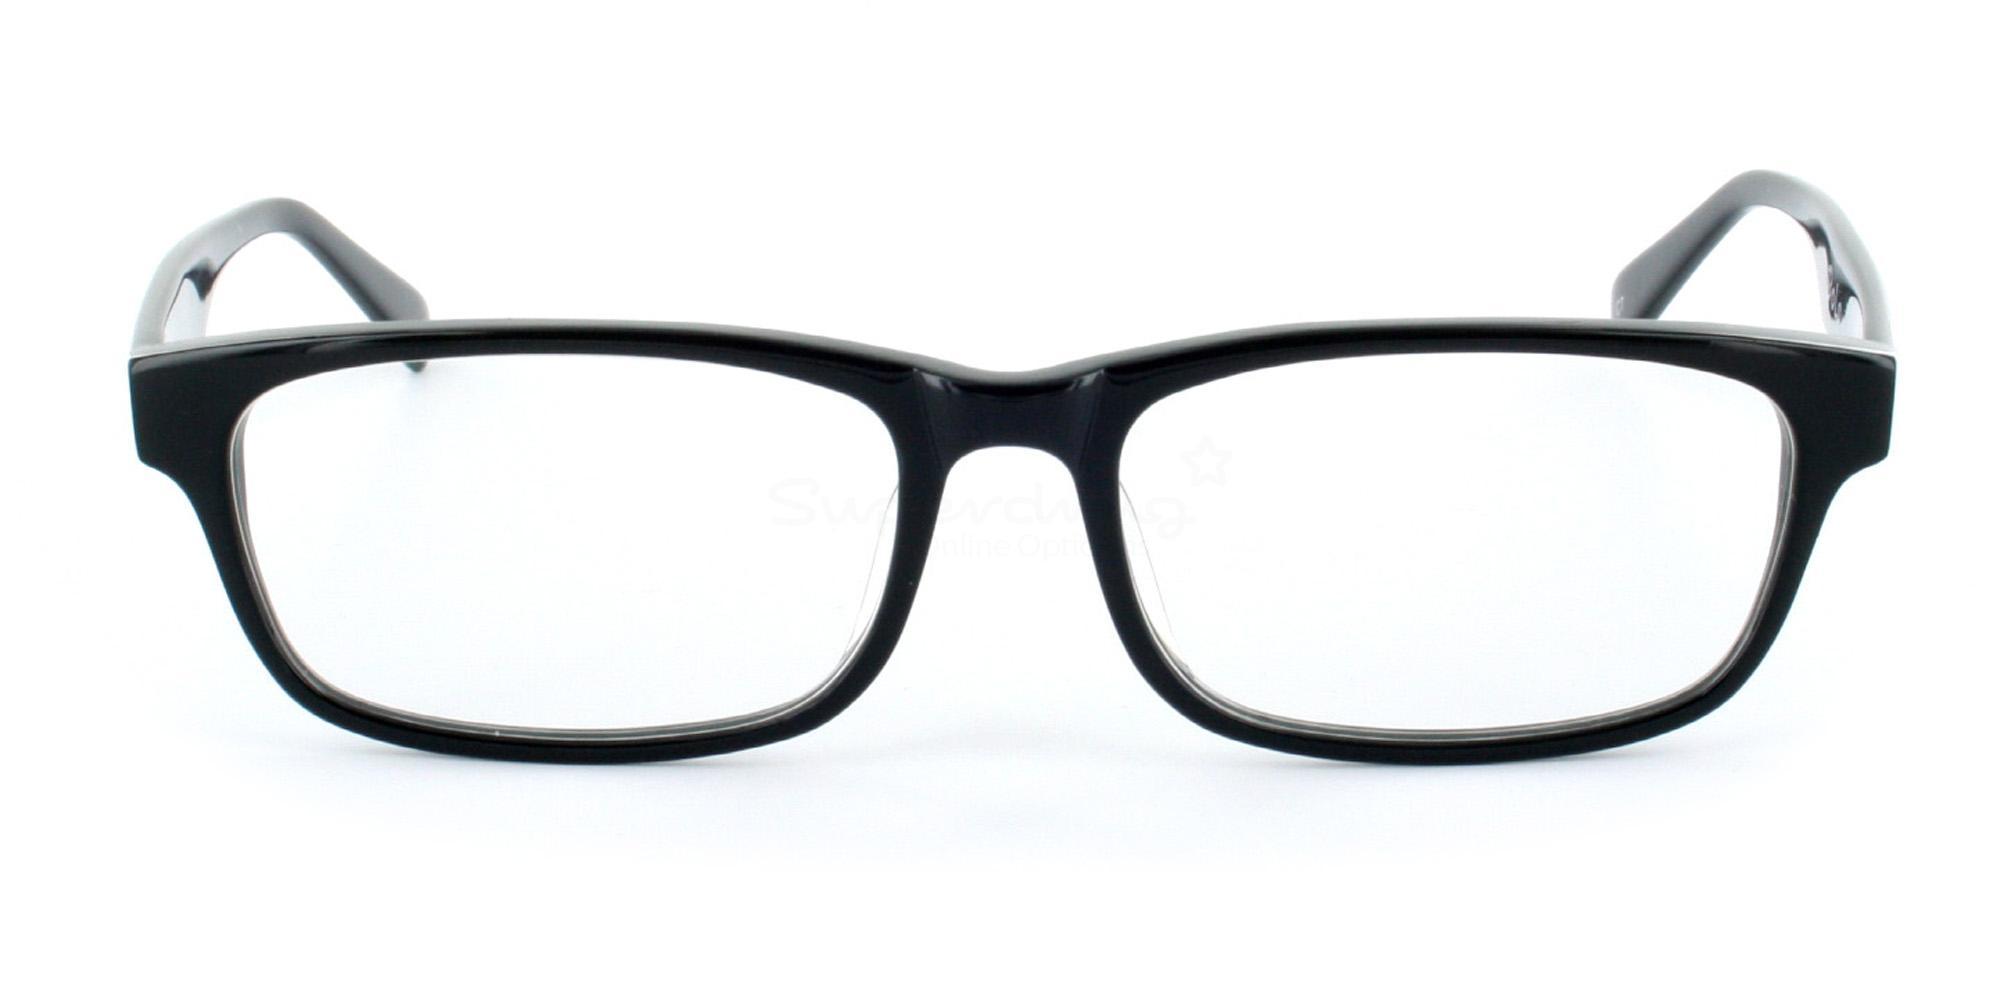 C7 HY81100 Glasses, Immense